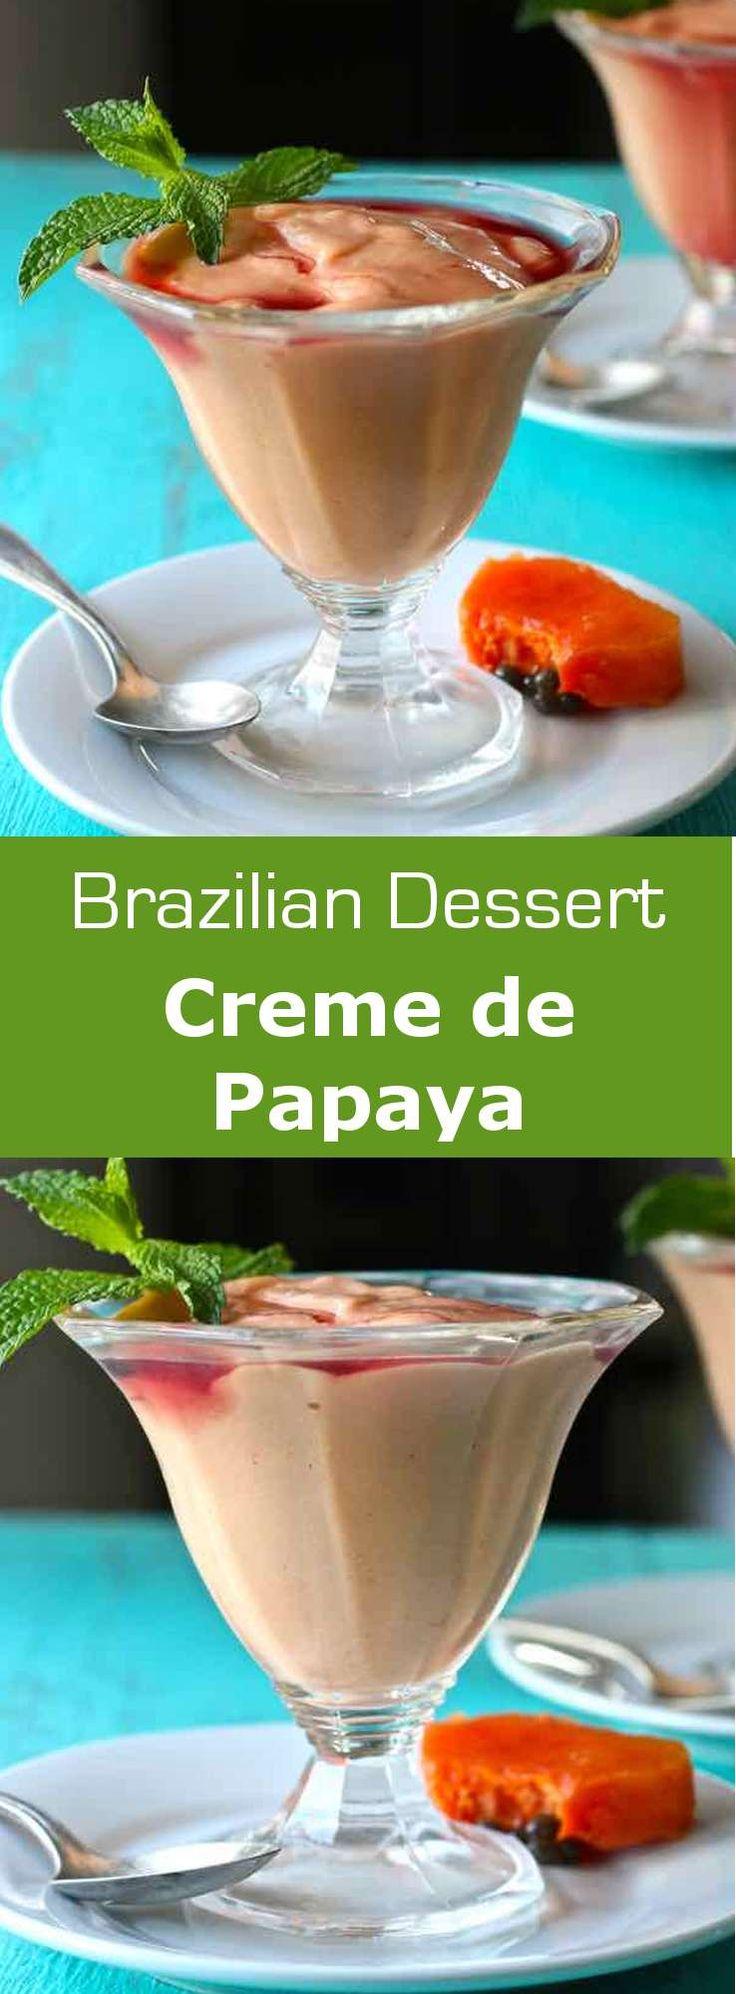 Creme de papaya is a very easy to make luscious Brazilian dessert that consists…